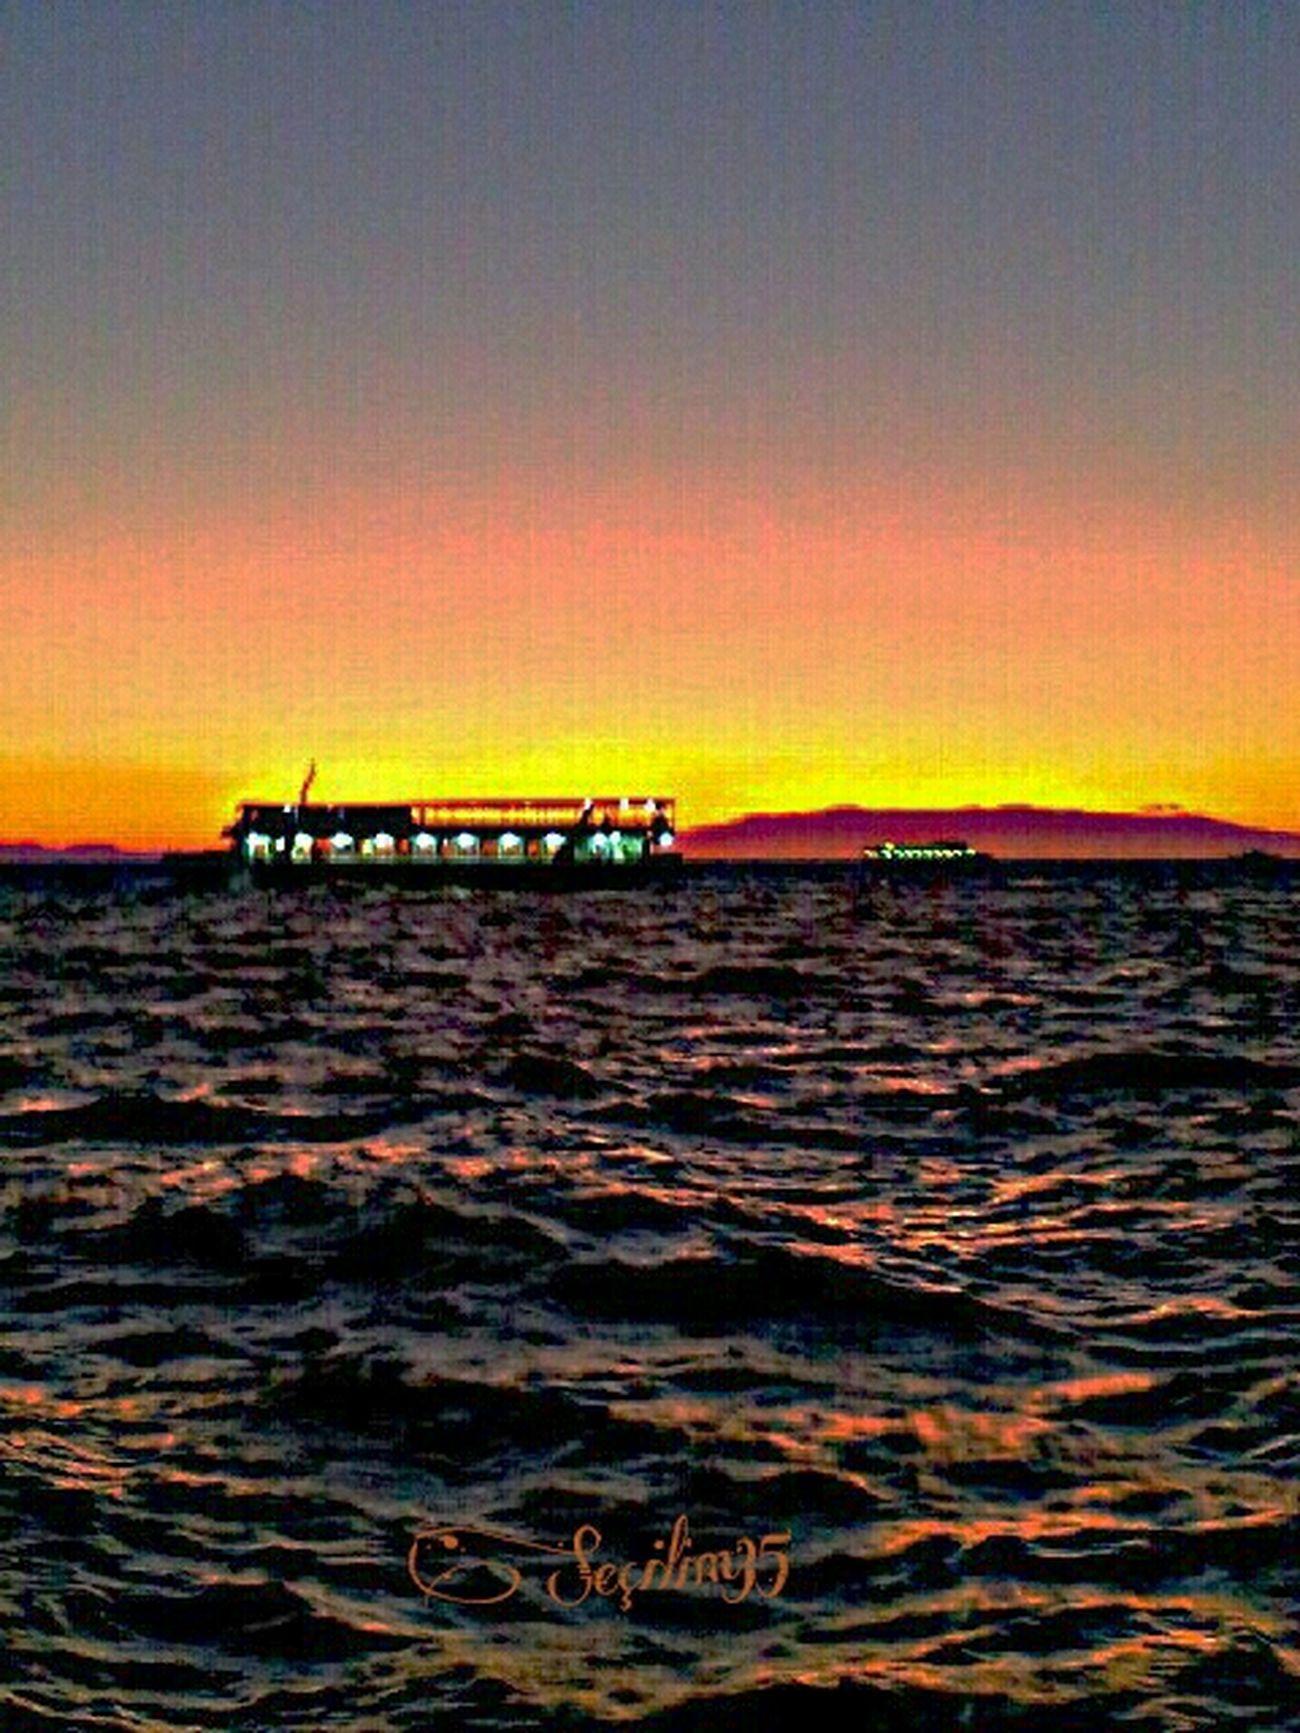 Uzaktaki yakinlar... Sea Love Turkey Izmir Sky_collection Sun_collection Nature_collection EyeEm Nature Lover